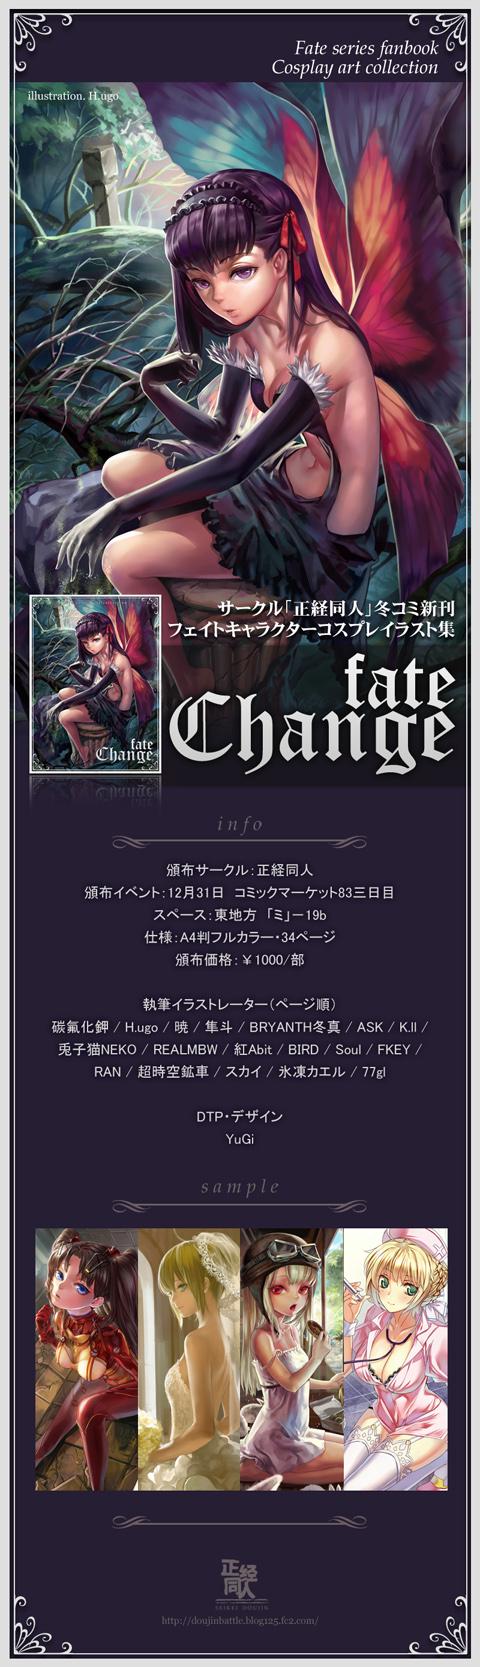 Fate Change